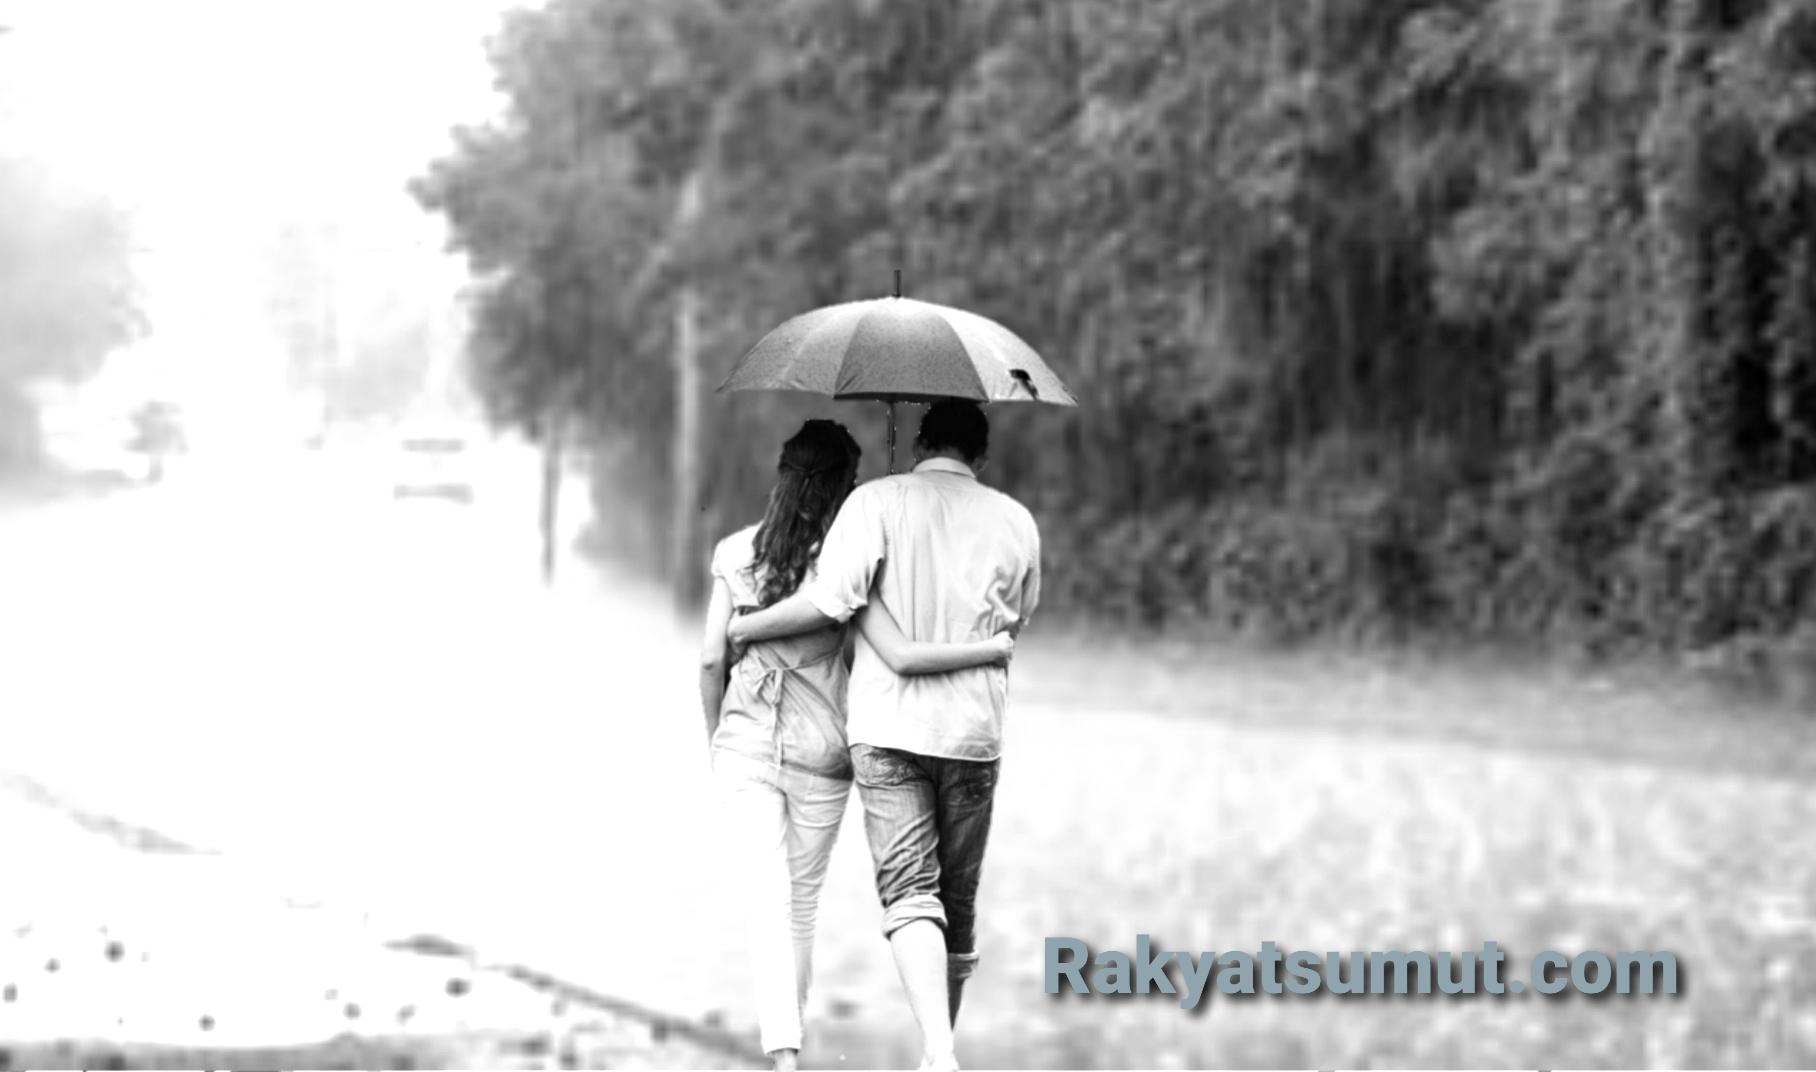 Ilustrasi hujan deras. Foto: Rakyatsumut.com